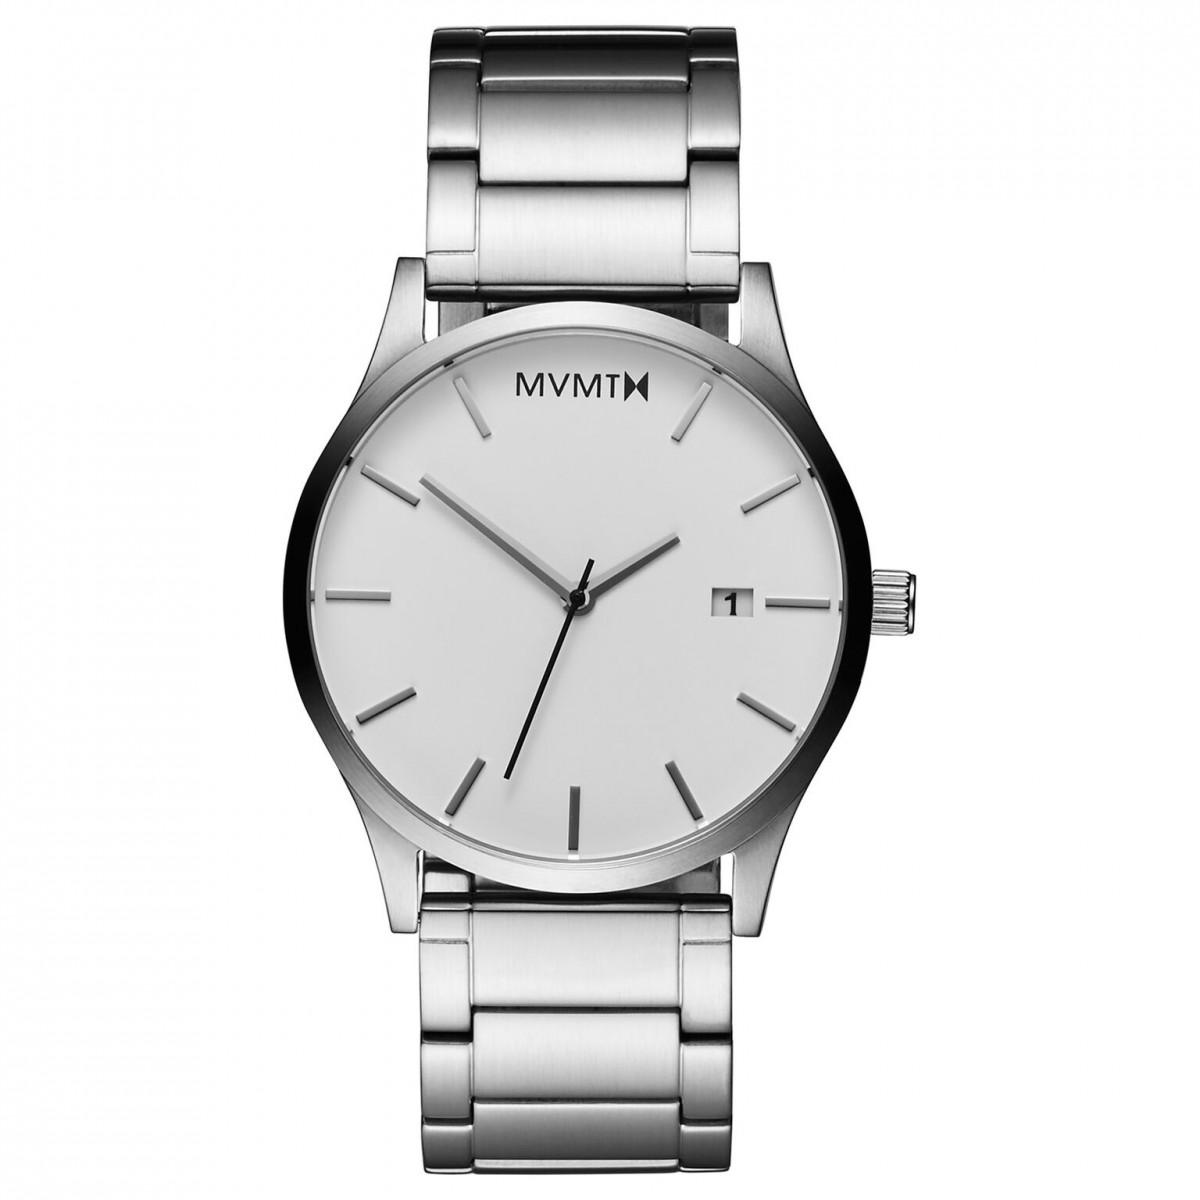 mvmt-classic-white-silver-l213-1b-131-ferfi-karora_b8cd647eea054c0ff90226350d79ddf8.jpg